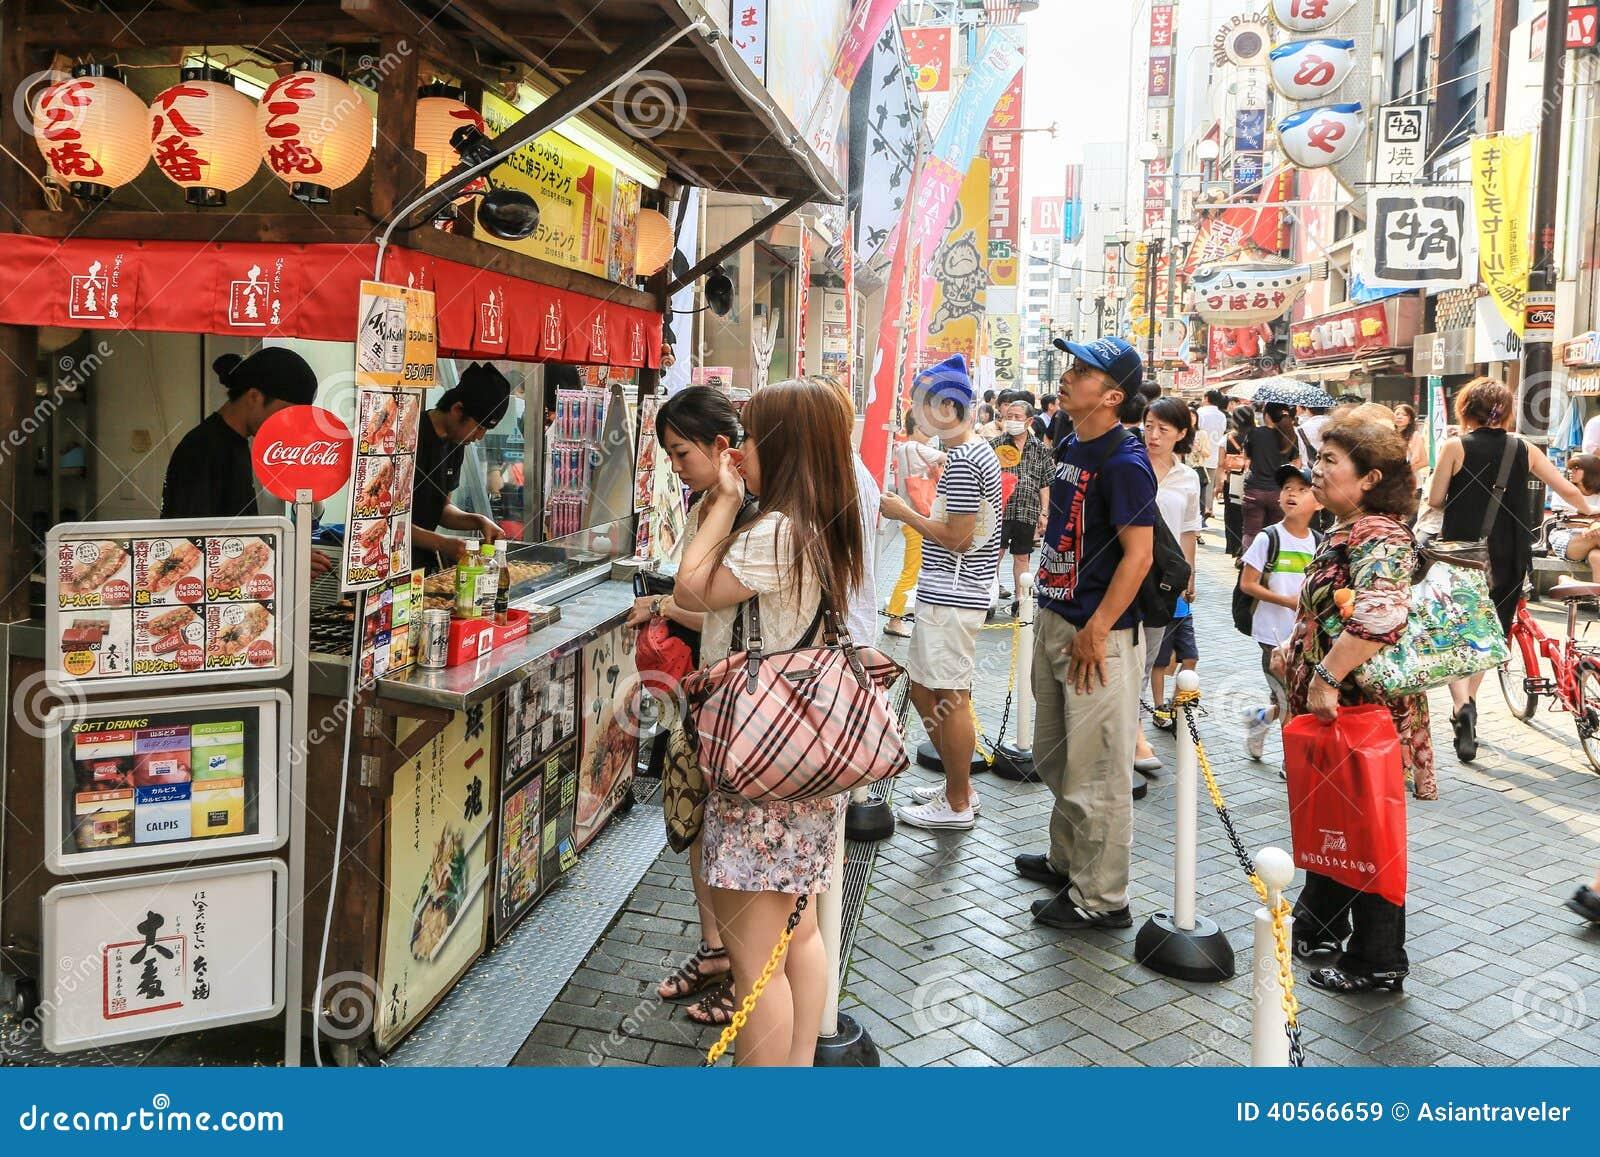 Road foodstuff japan  taiwan seafood recipes streets in taiwan